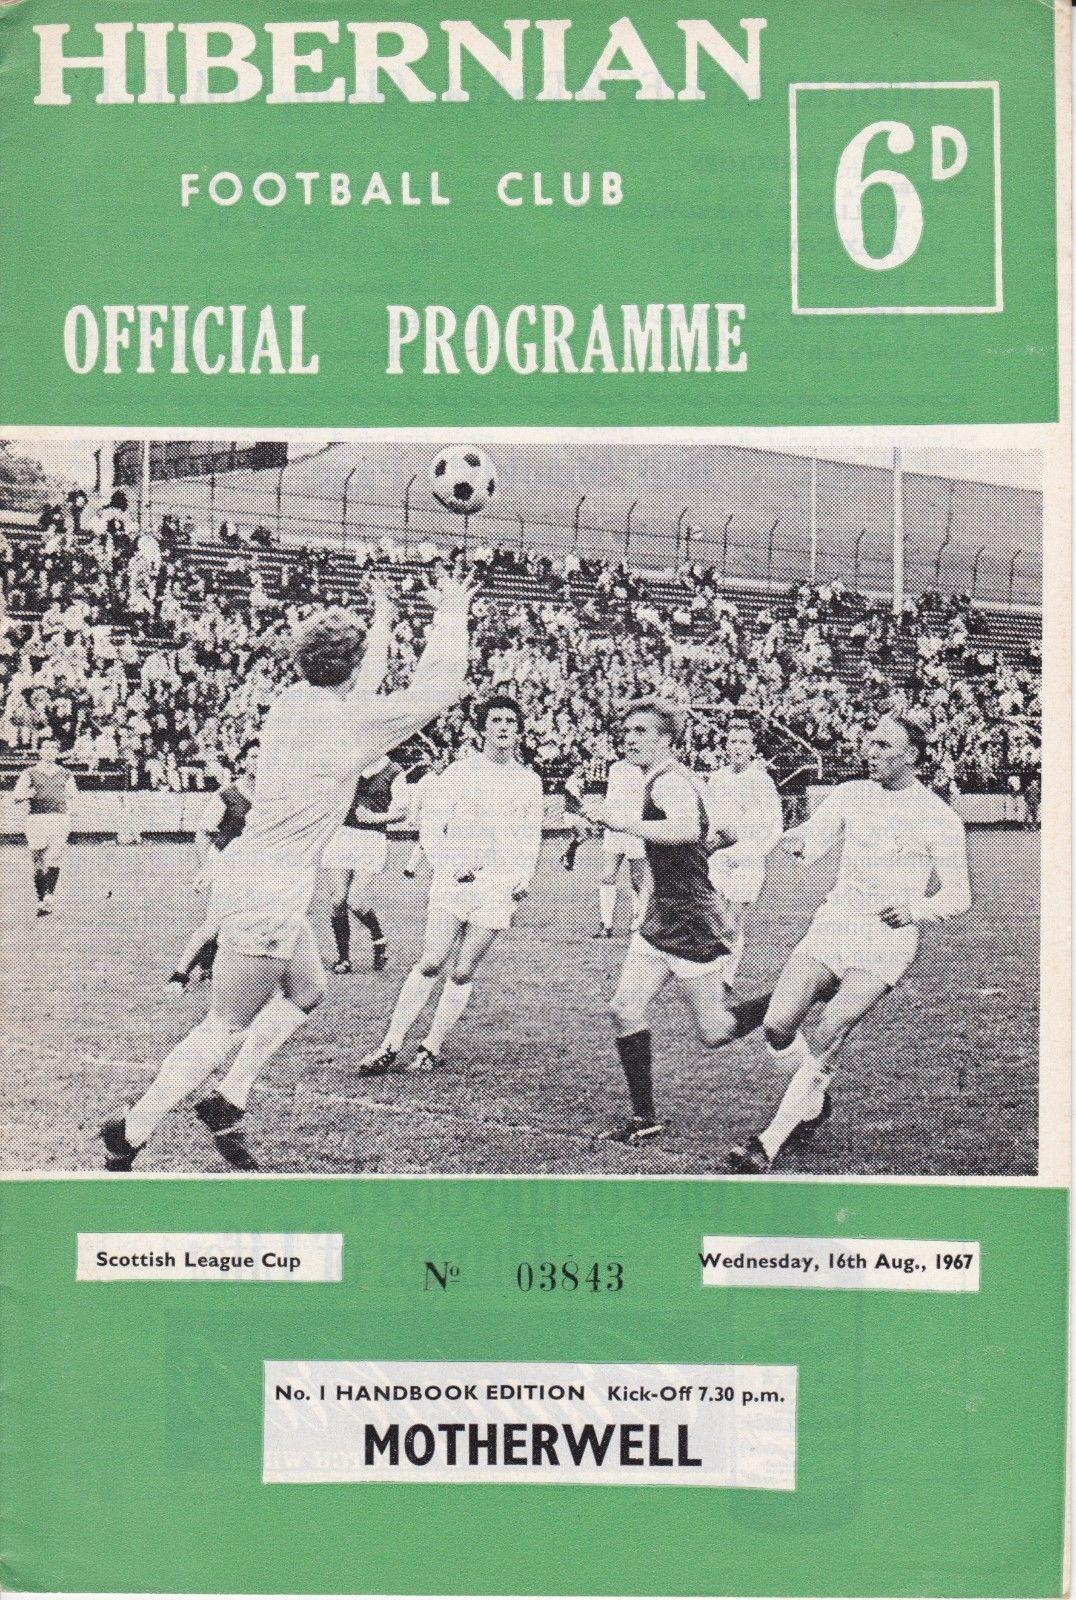 versus Hibernian Programme Cover